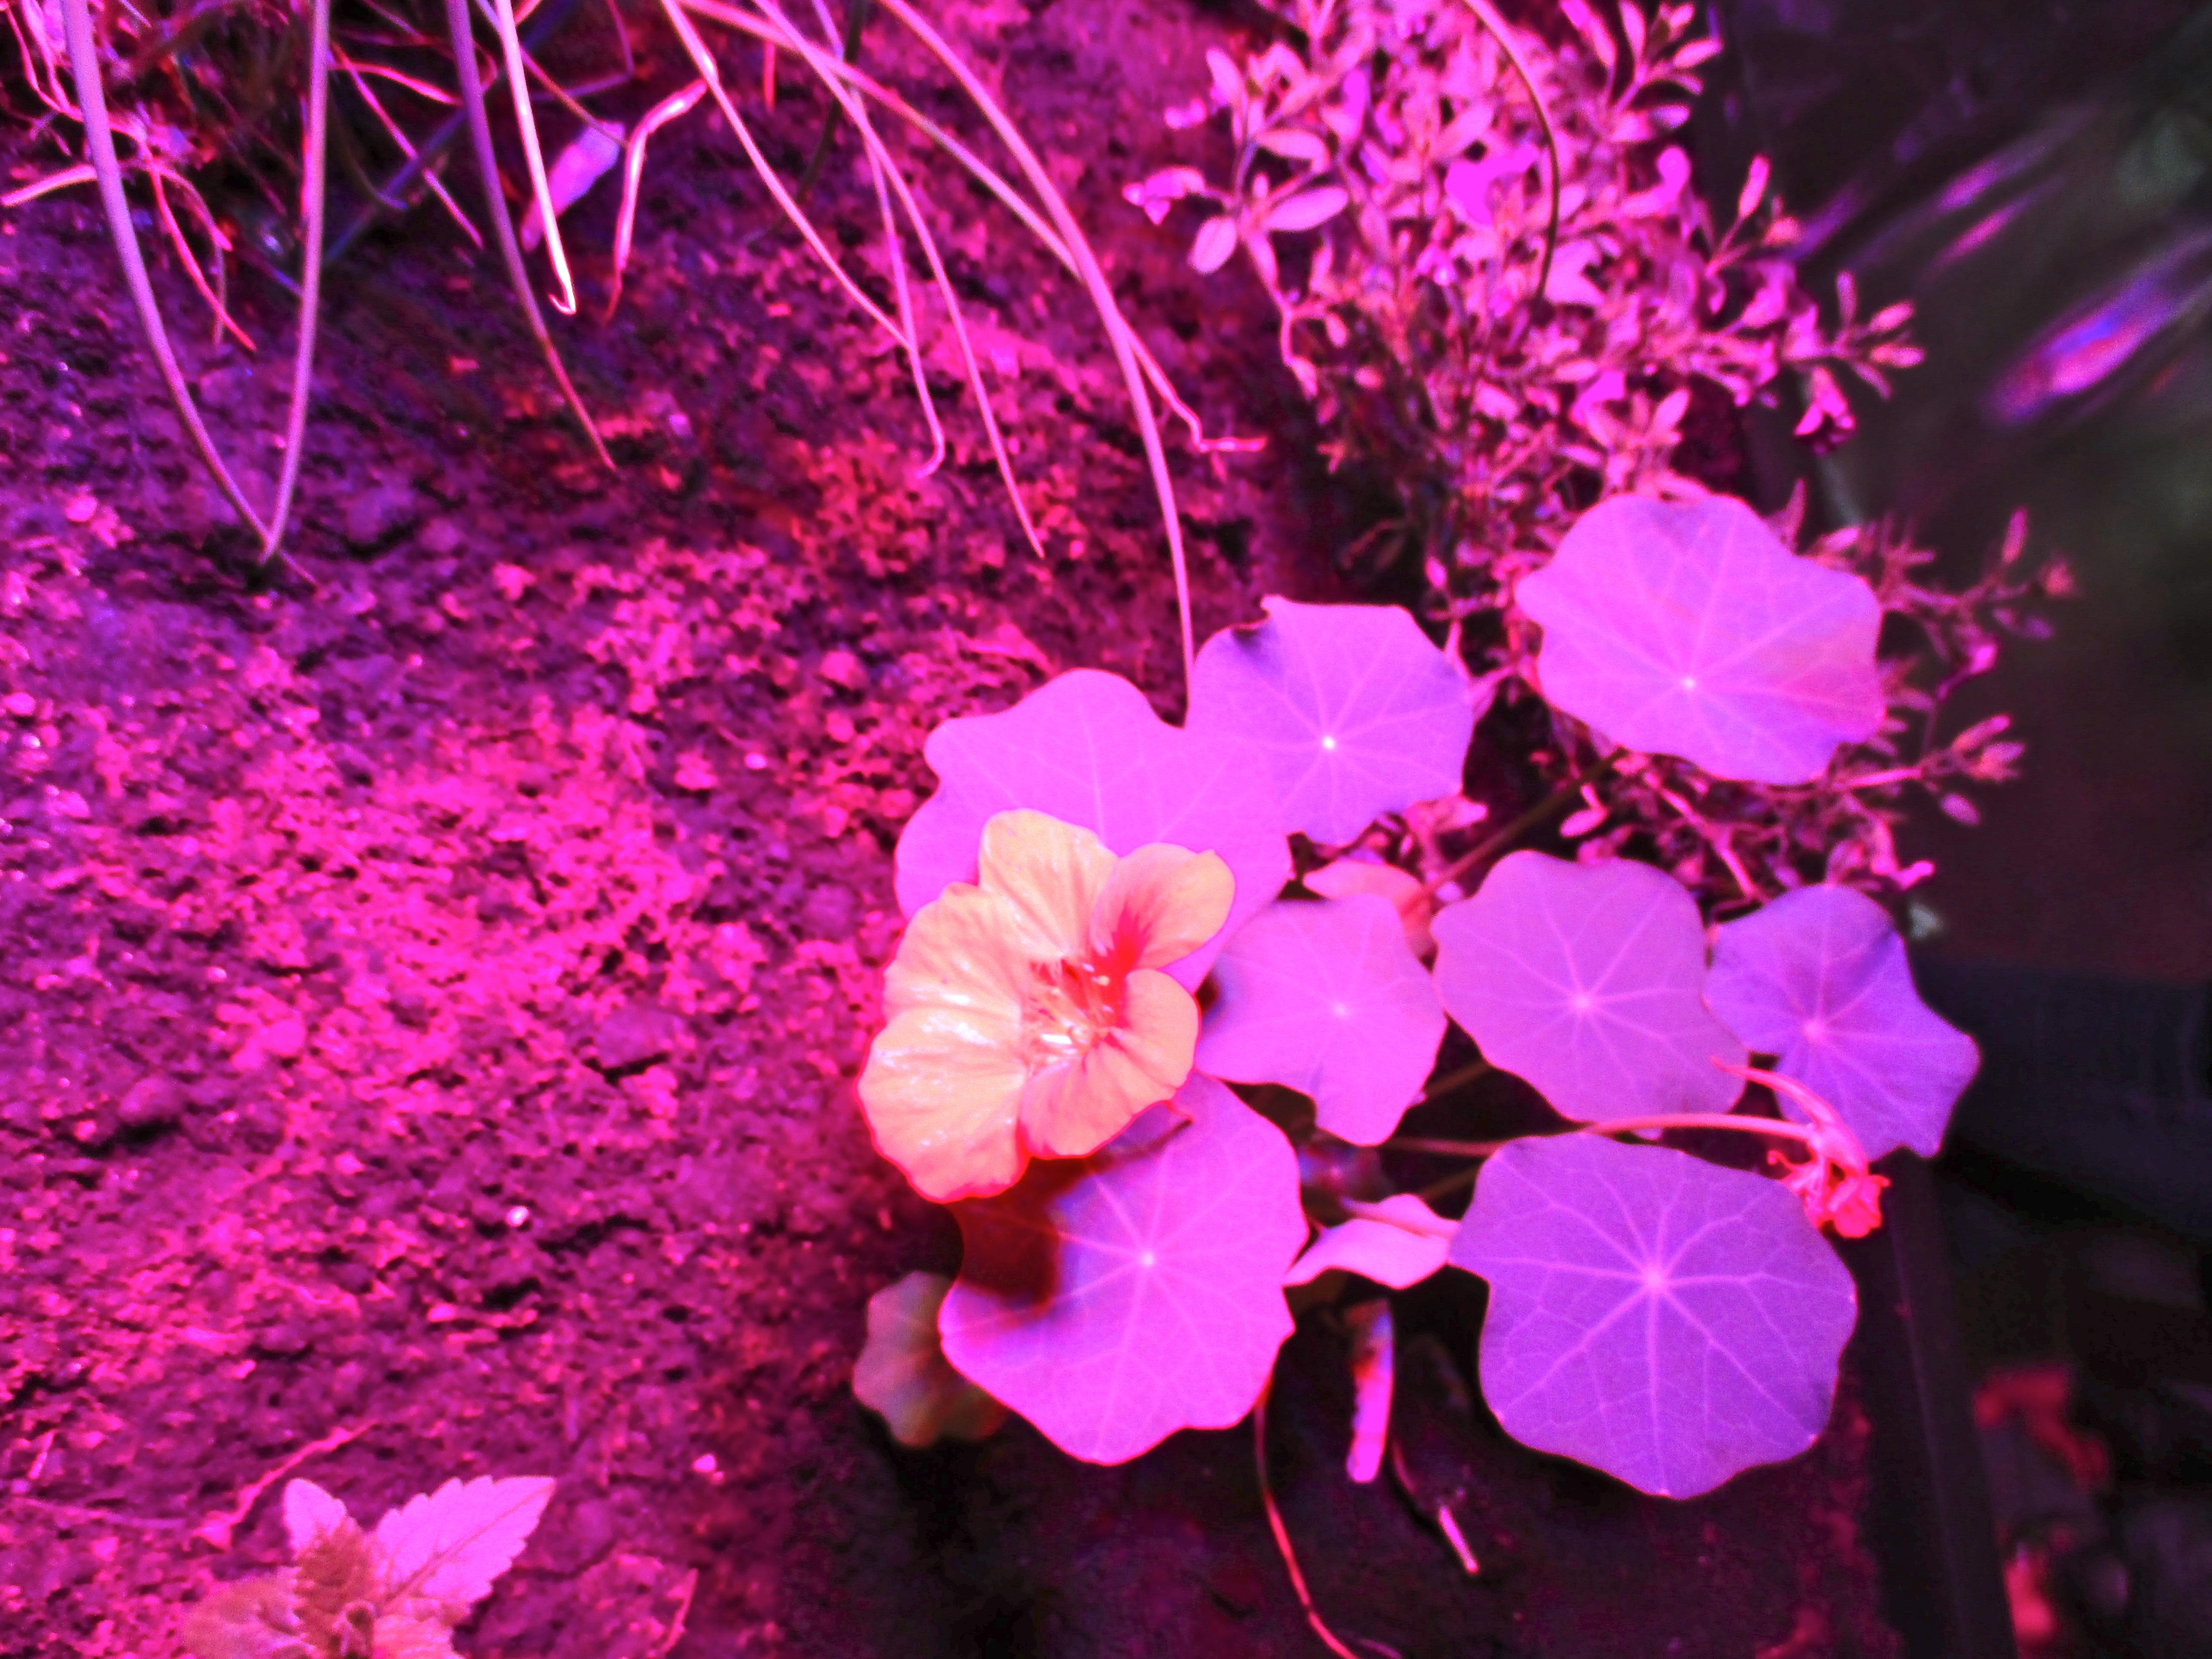 Paula Cooper Gallery Presents Meg Webster's Solar Grow Room